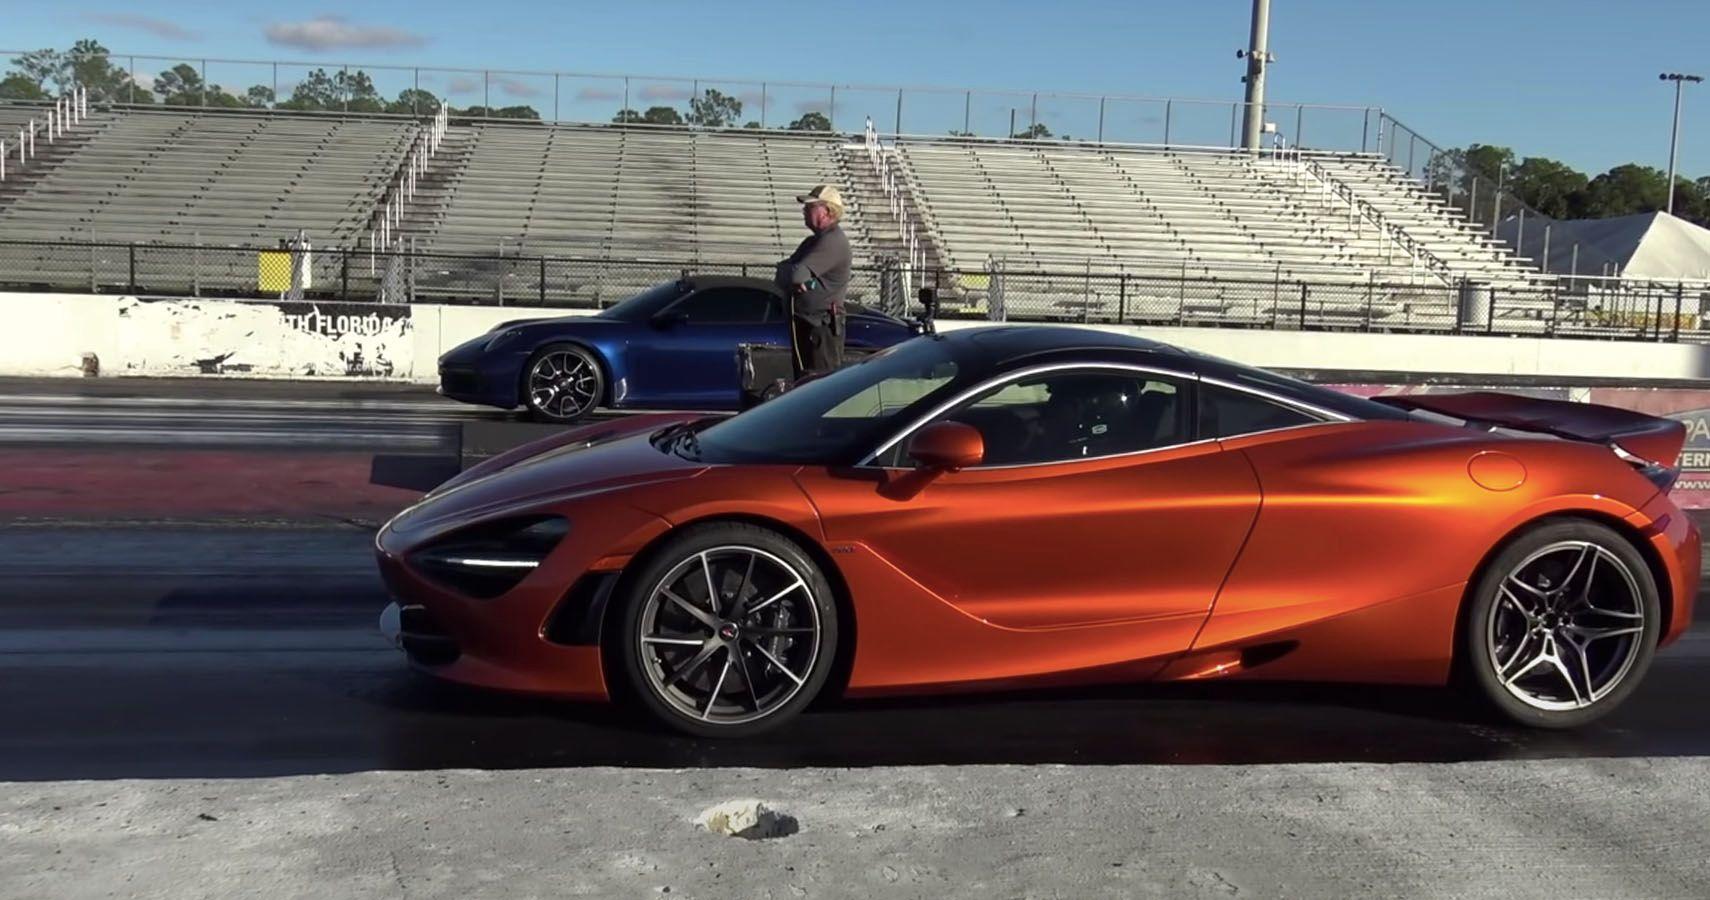 Watch A Tuned Porsche Turbo S Challenge A McLaren 720S At The Strip